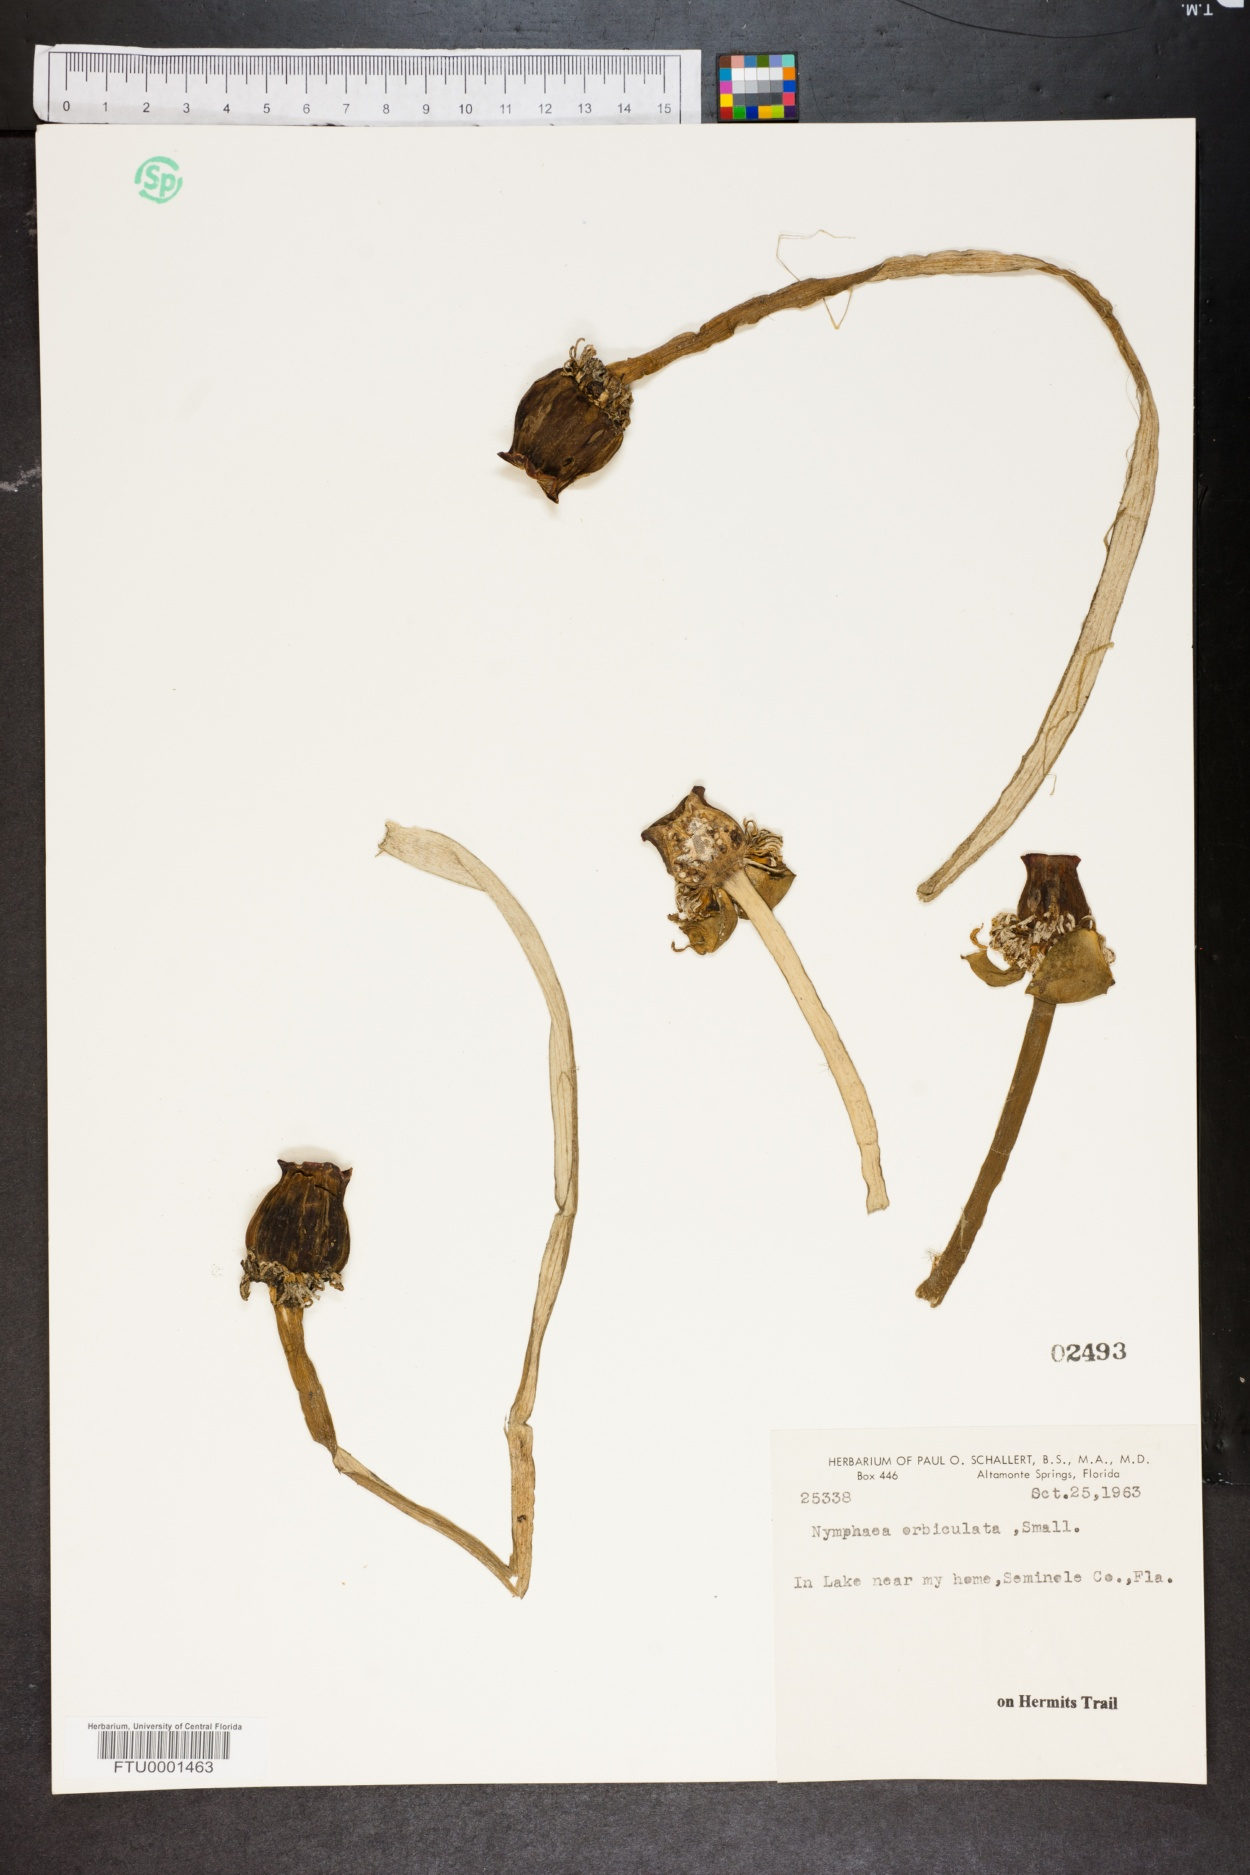 Nymphaea orbiculata image